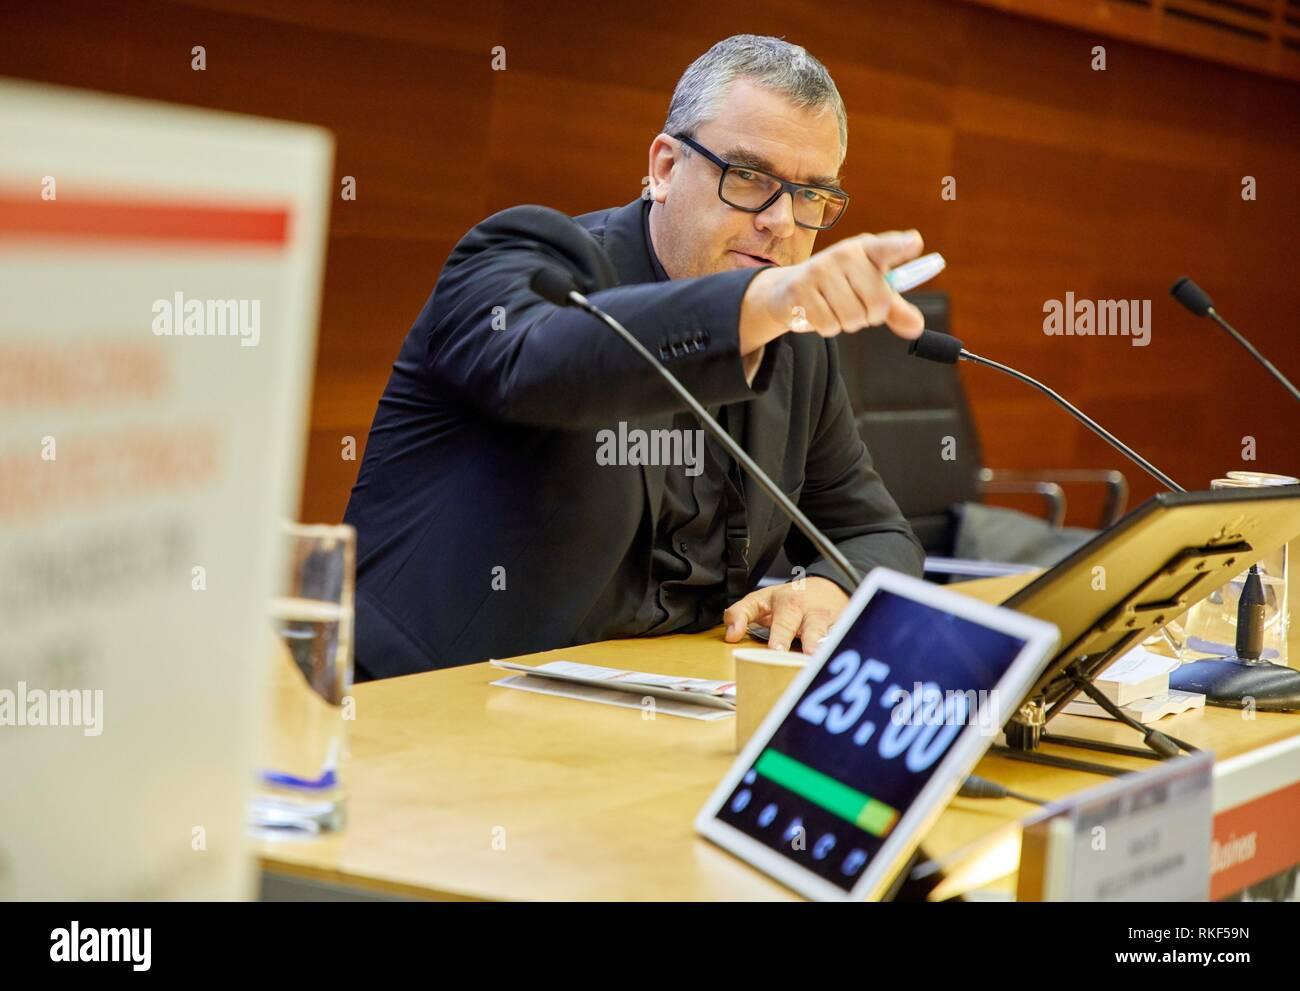 Congress moderator controlling the time, Kursaal Congress Palace, Donostia, San Sebastian, Gipuzkoa, Basque Country, Spain, Europe - Stock Image